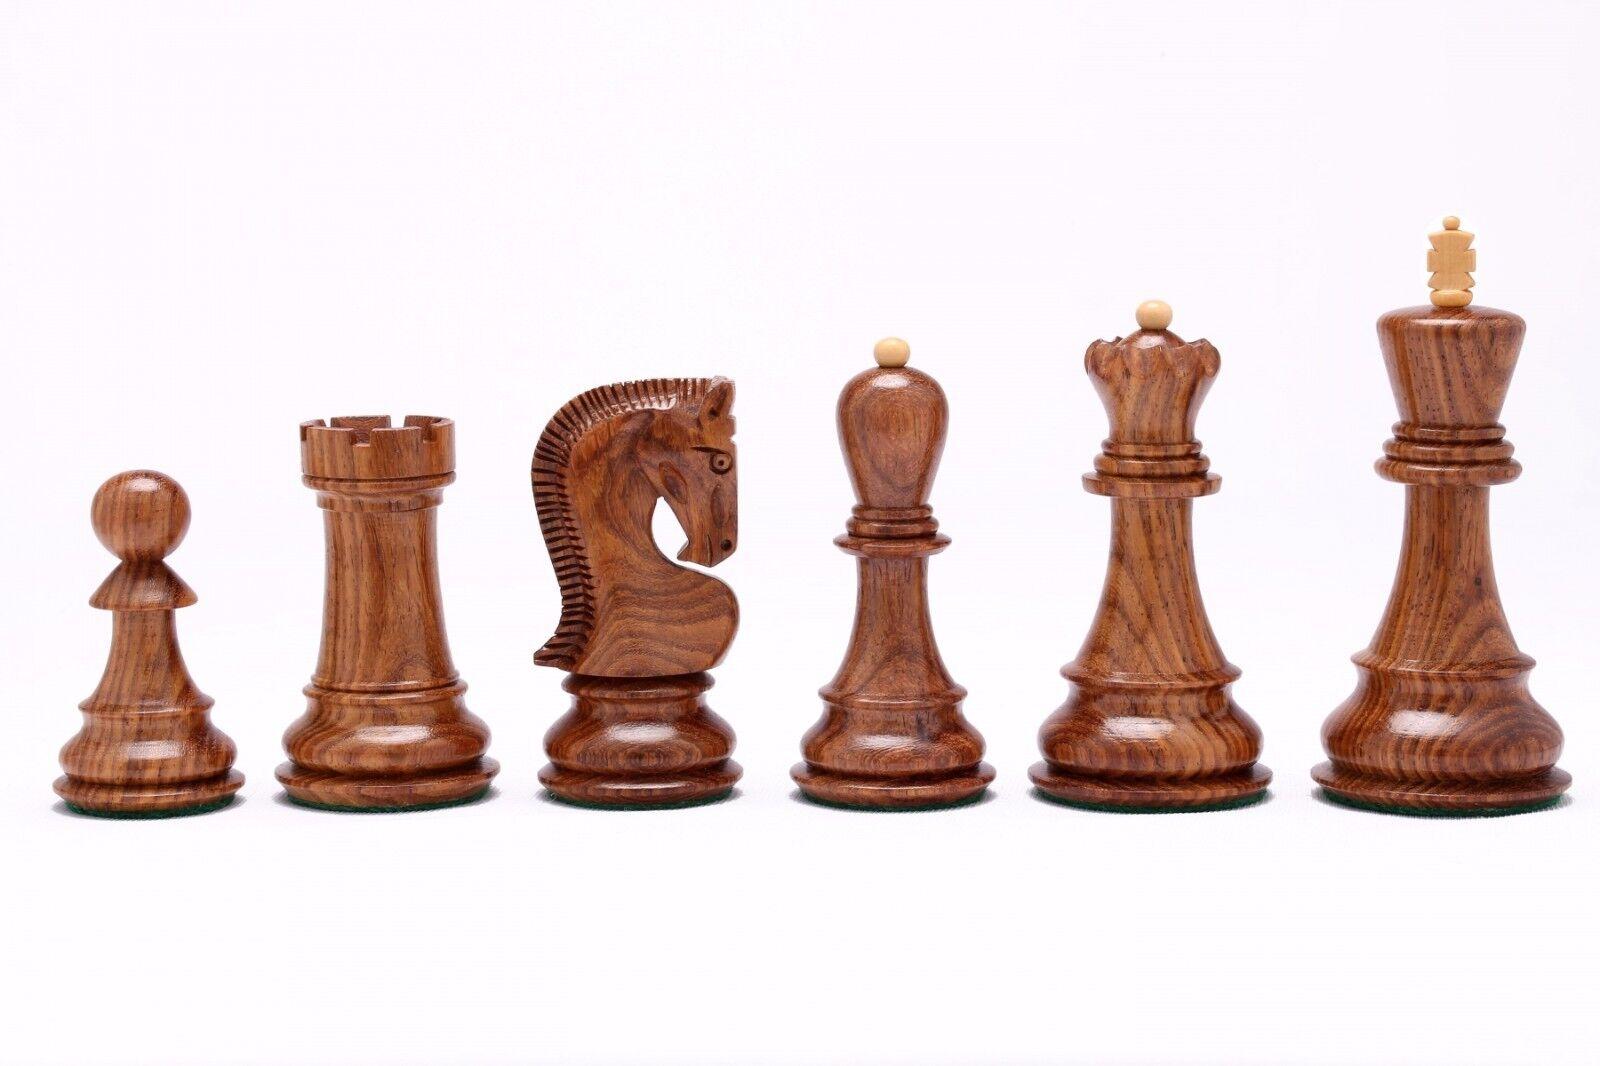 Chessbazaar Exclusive Russian Zagreb Zagreb Zagreb Chess Pieces in Sheesham Wood - 3.9  S1236 8a1539